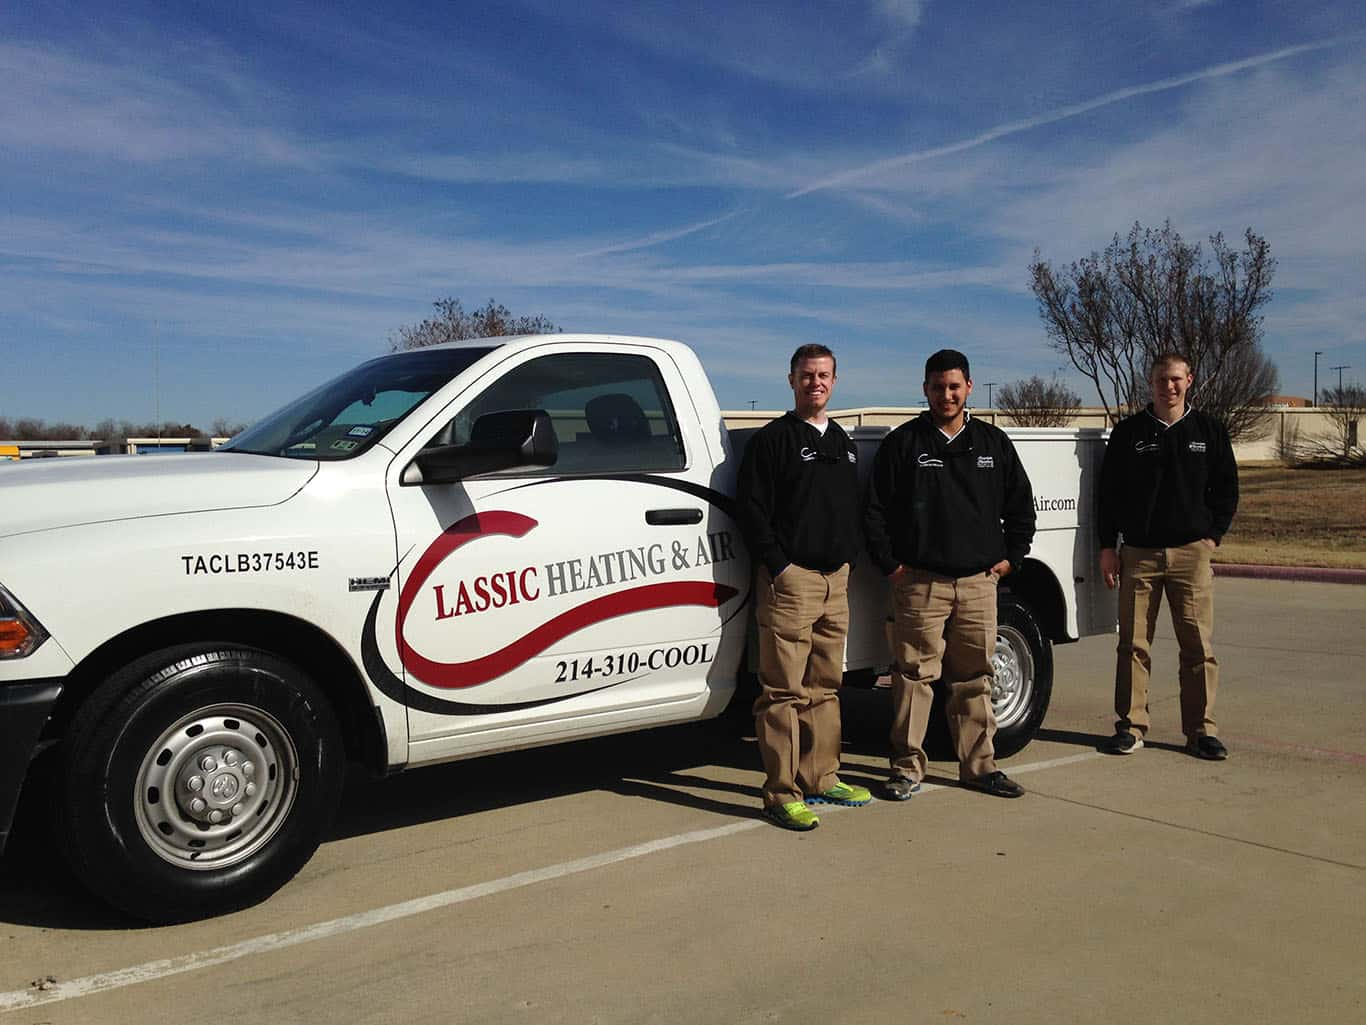 3 men in Classic Heating & Air uniform posing next to Classic Heating & Air pickup truck